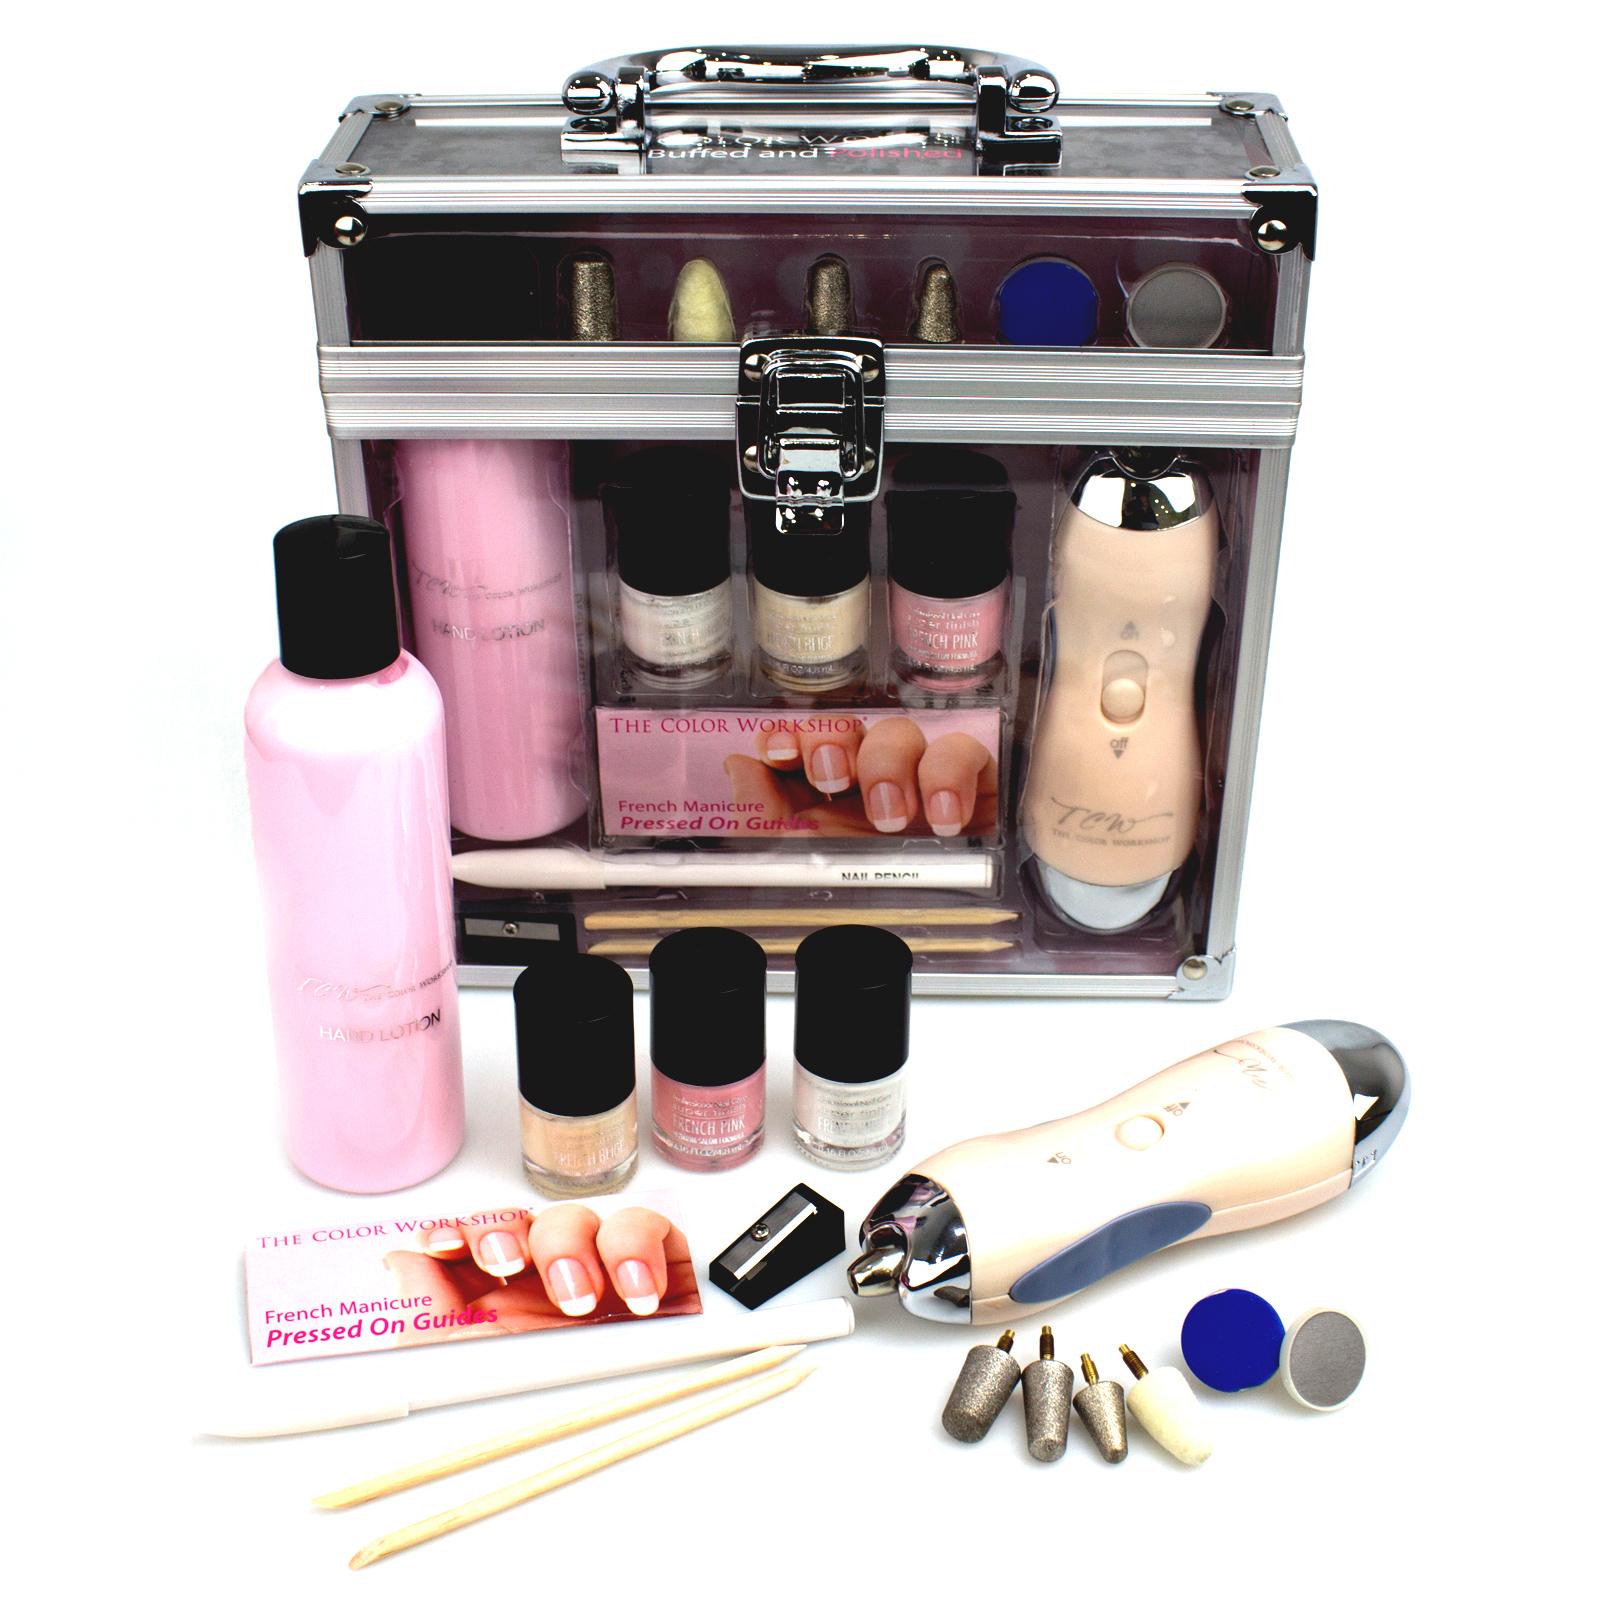 french manicure nail polish colour coat set varnish kit art pressed on 17 piece ebay. Black Bedroom Furniture Sets. Home Design Ideas